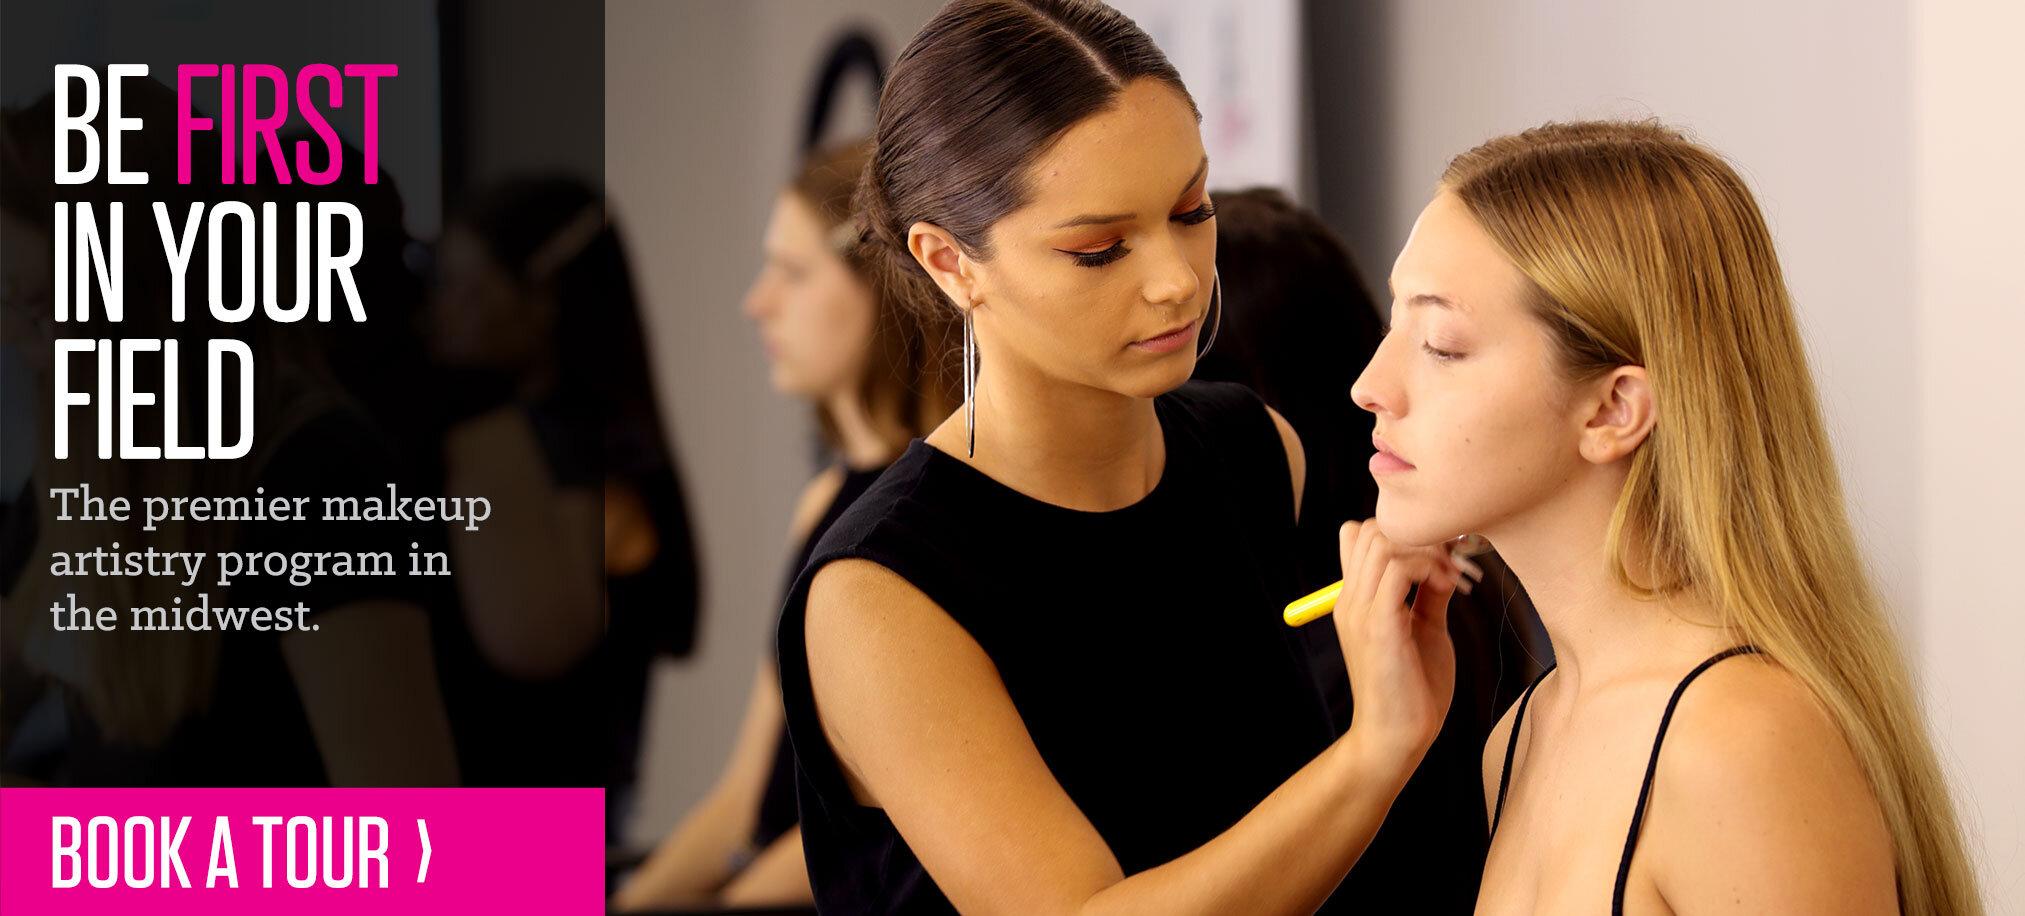 Make Up First School Of Makeup Artistry